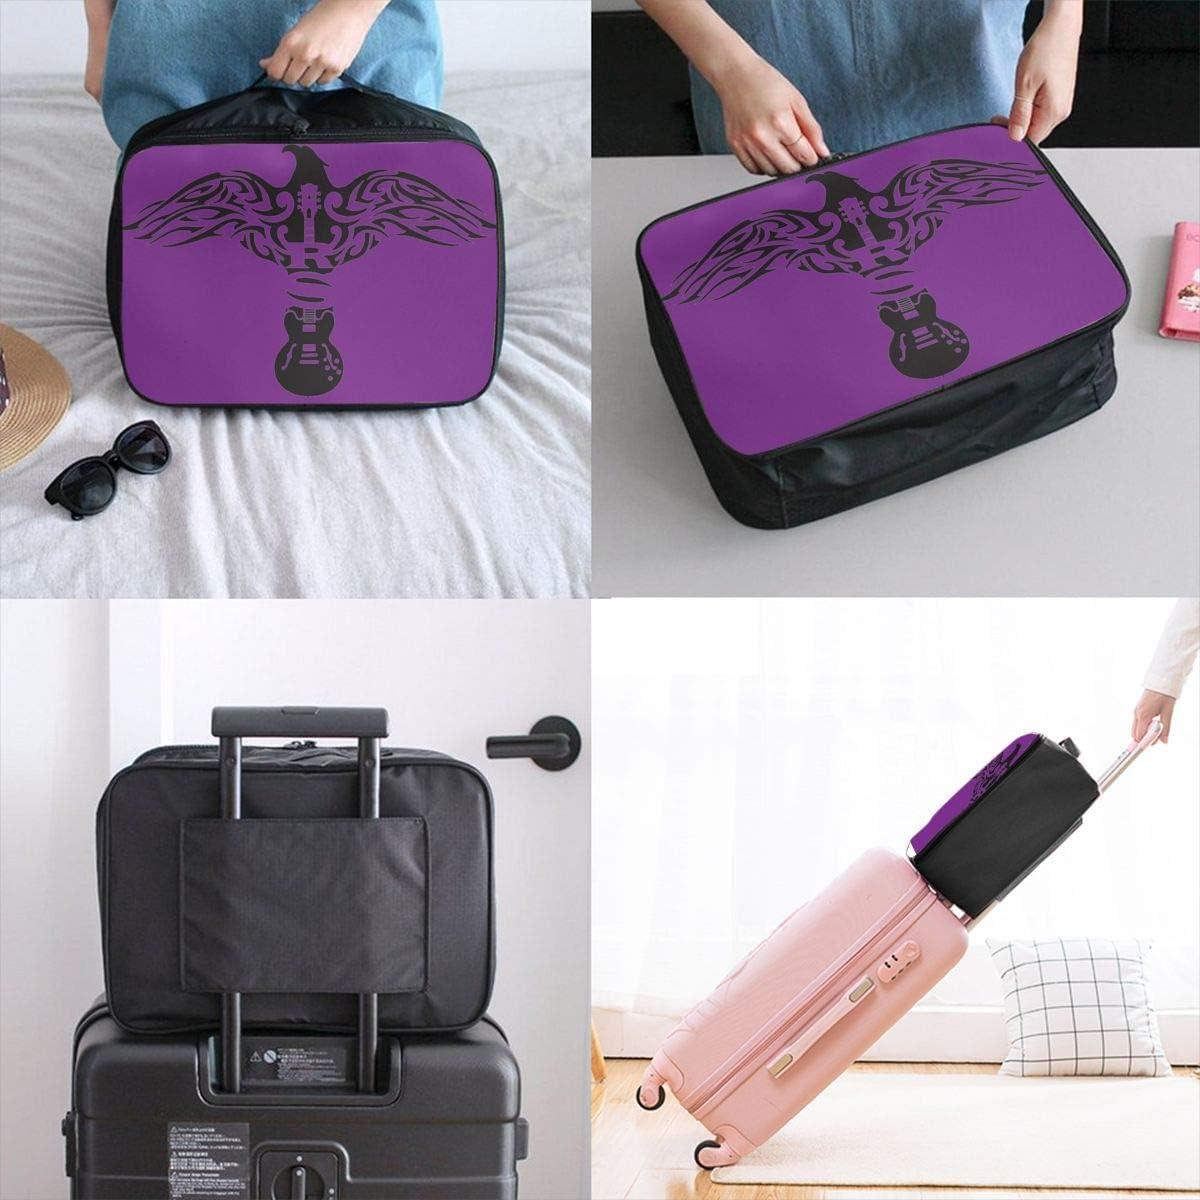 CGWIG Rick Springfield Travel Duffel Bag Waterproof Fashion Lightweight Large Capacity Portable Luggage Bag One Size